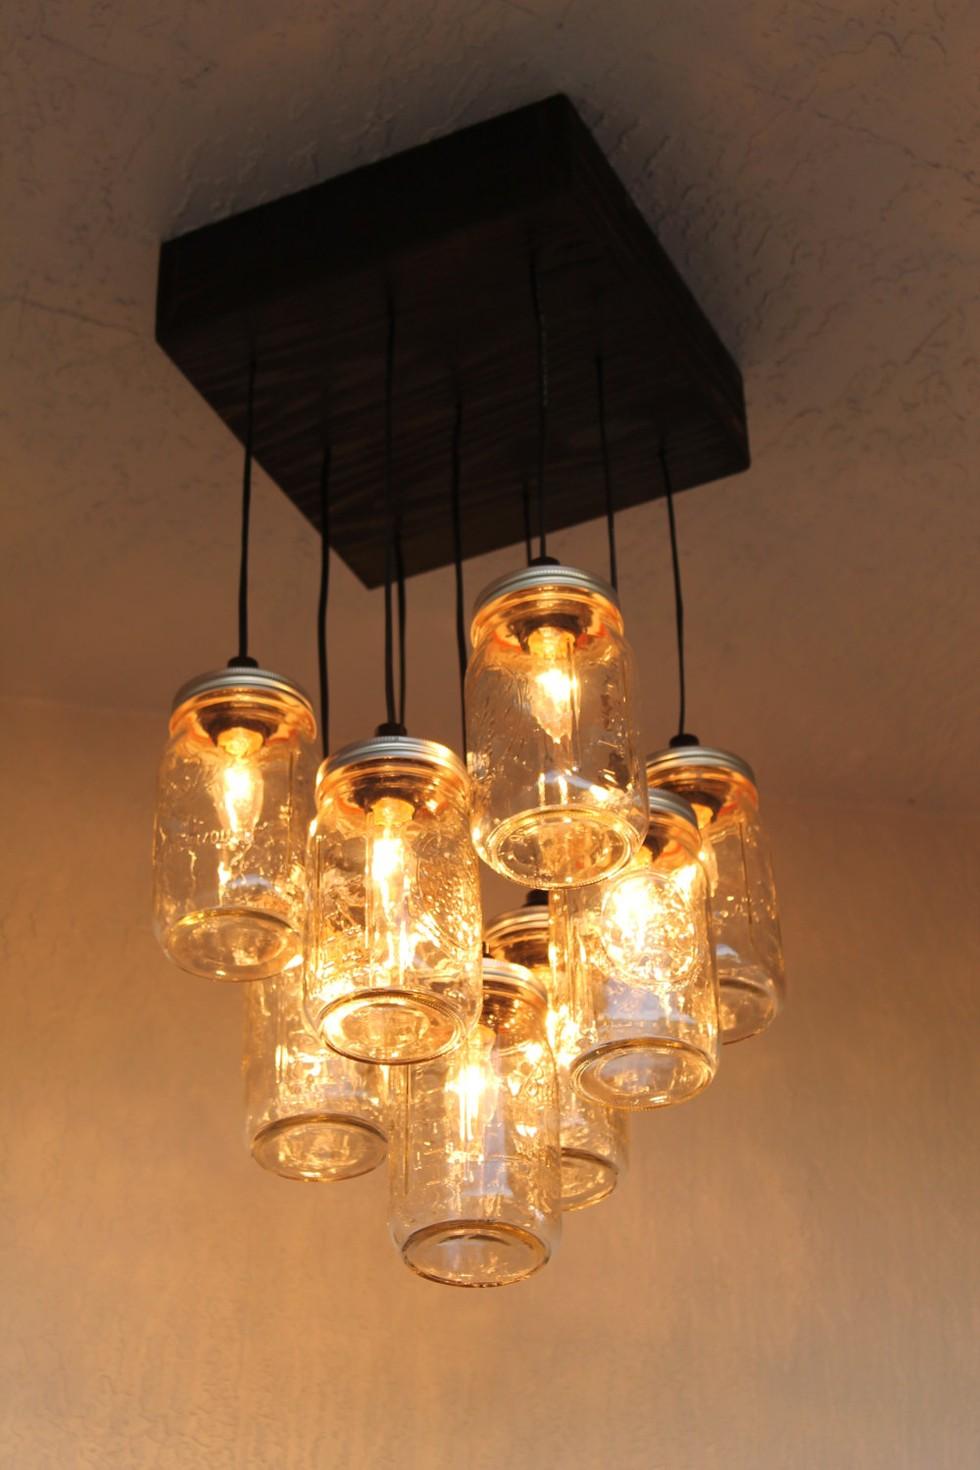 Mason Jar Lighting Diy – Mason Jar Chandelier Diy